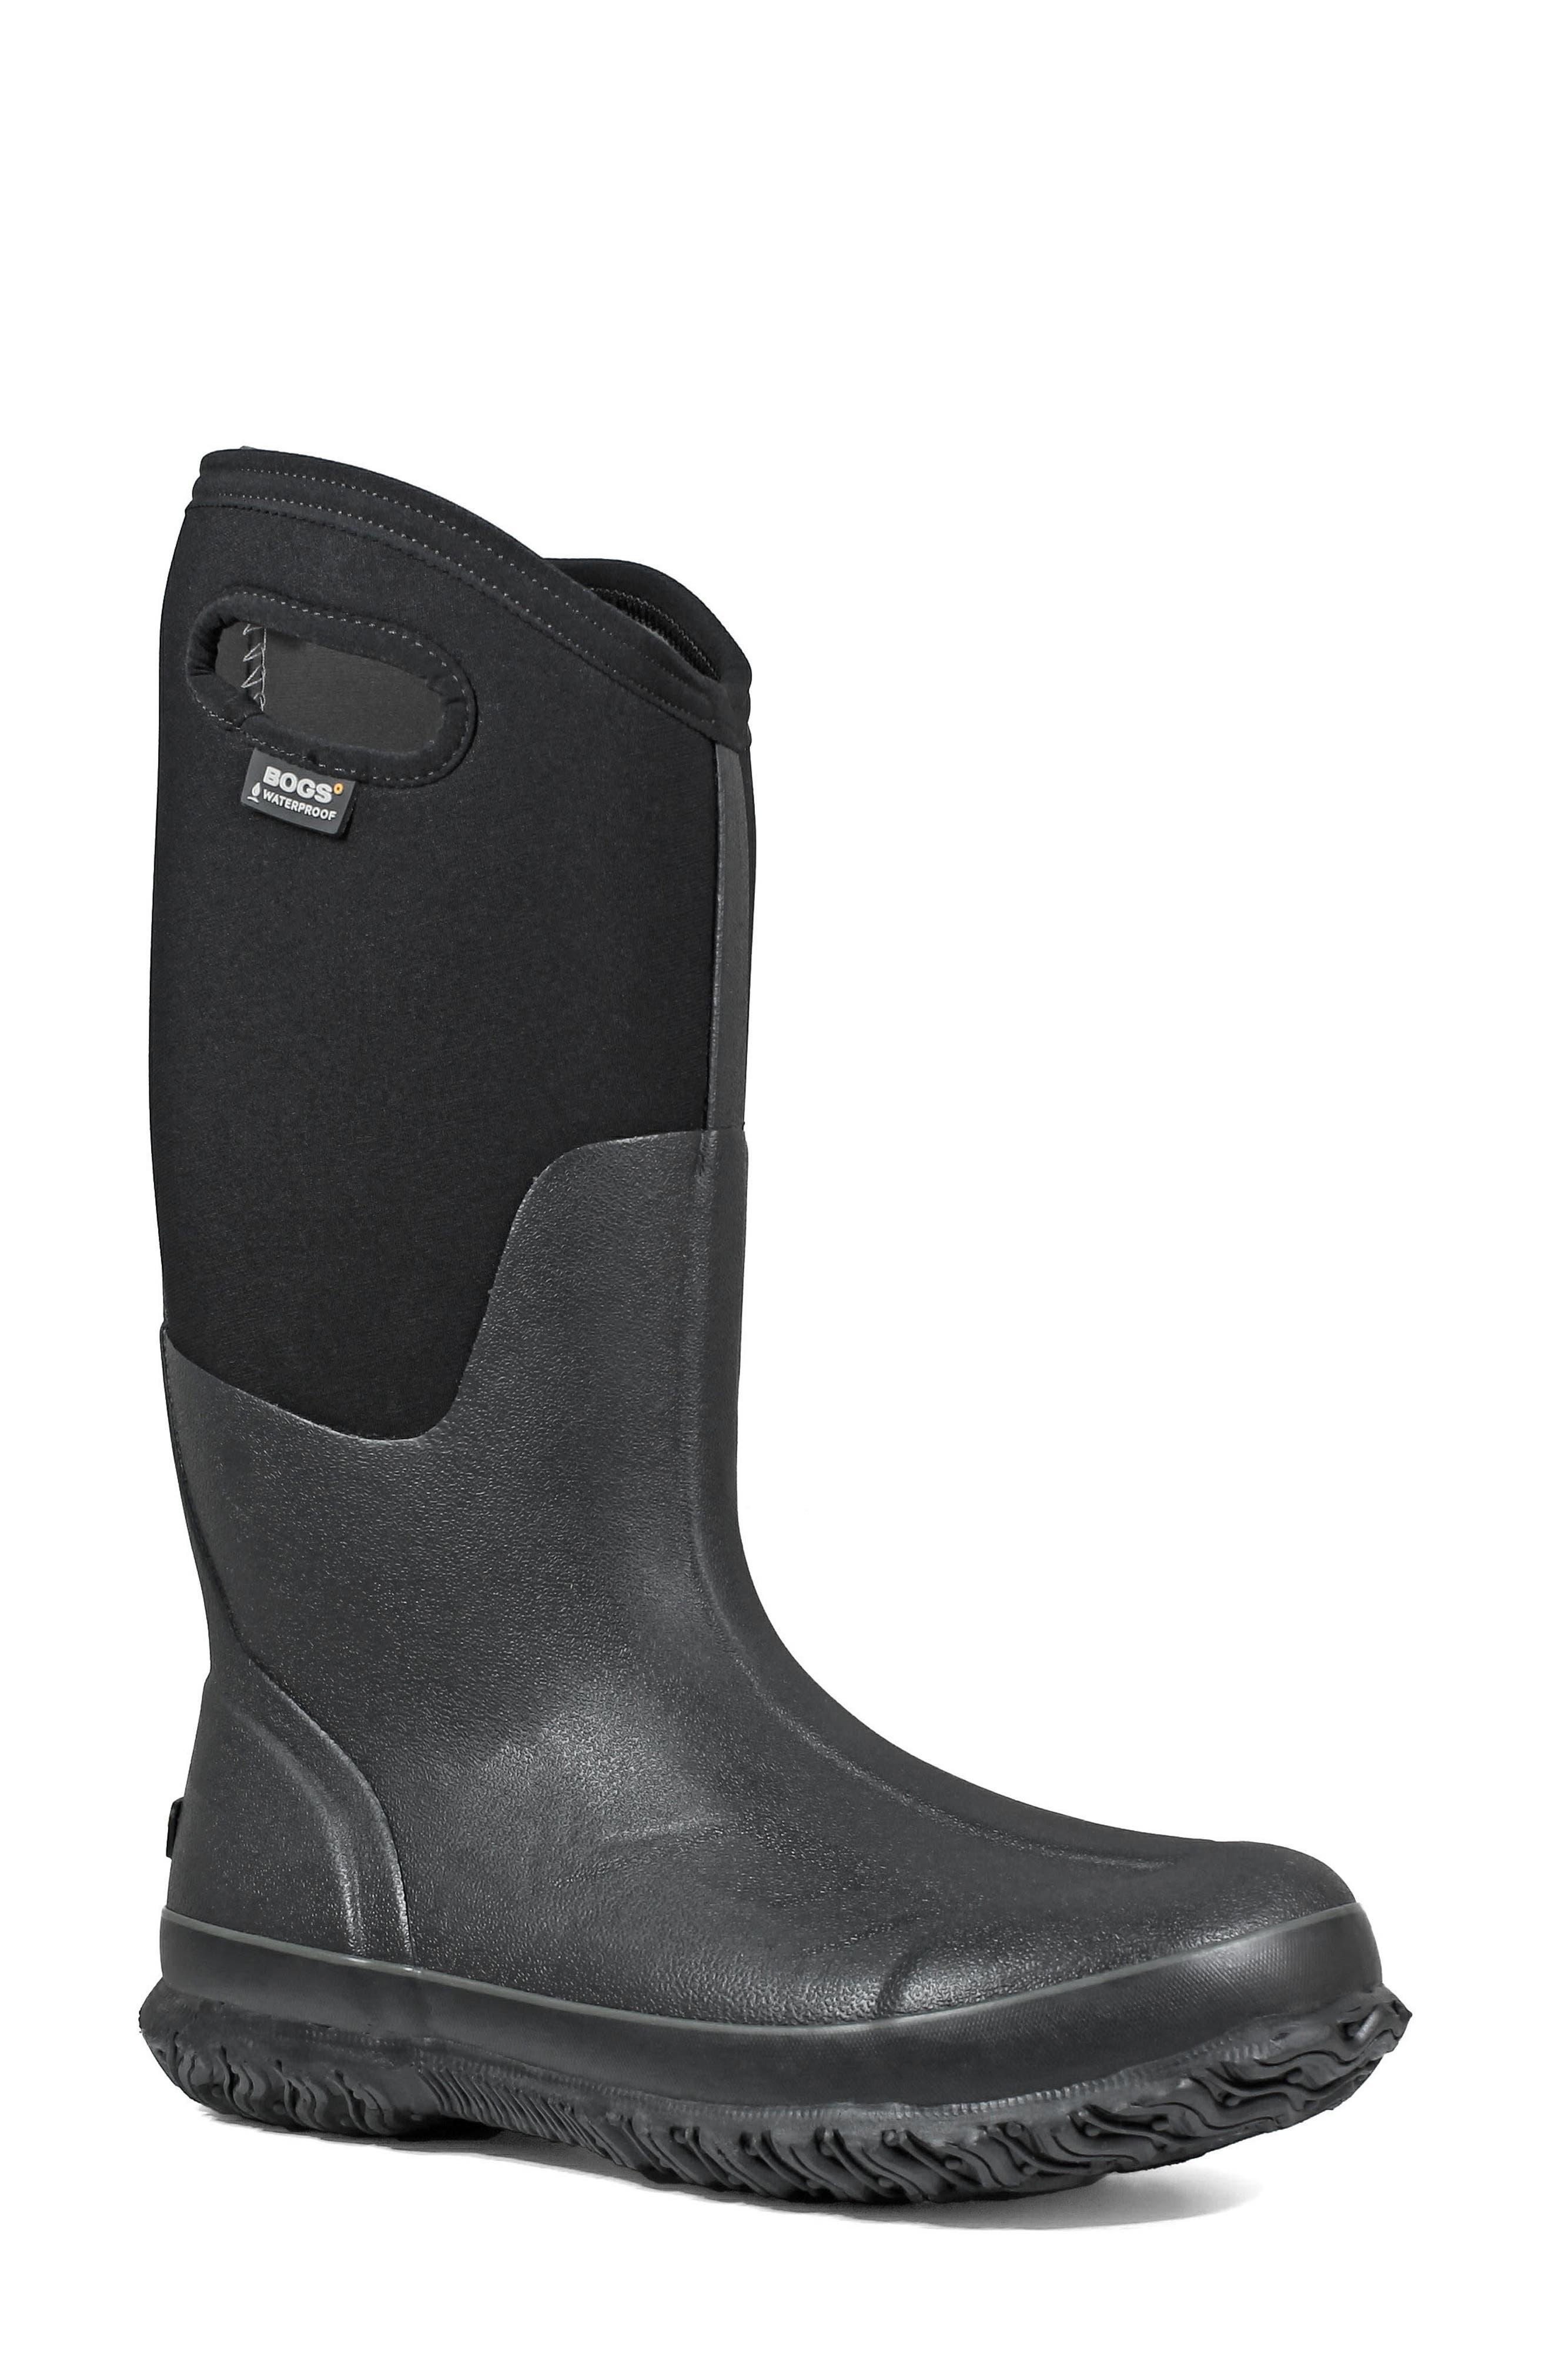 Bogs Classic Tall Waterproof Snow Boot, Wide Calf- Black